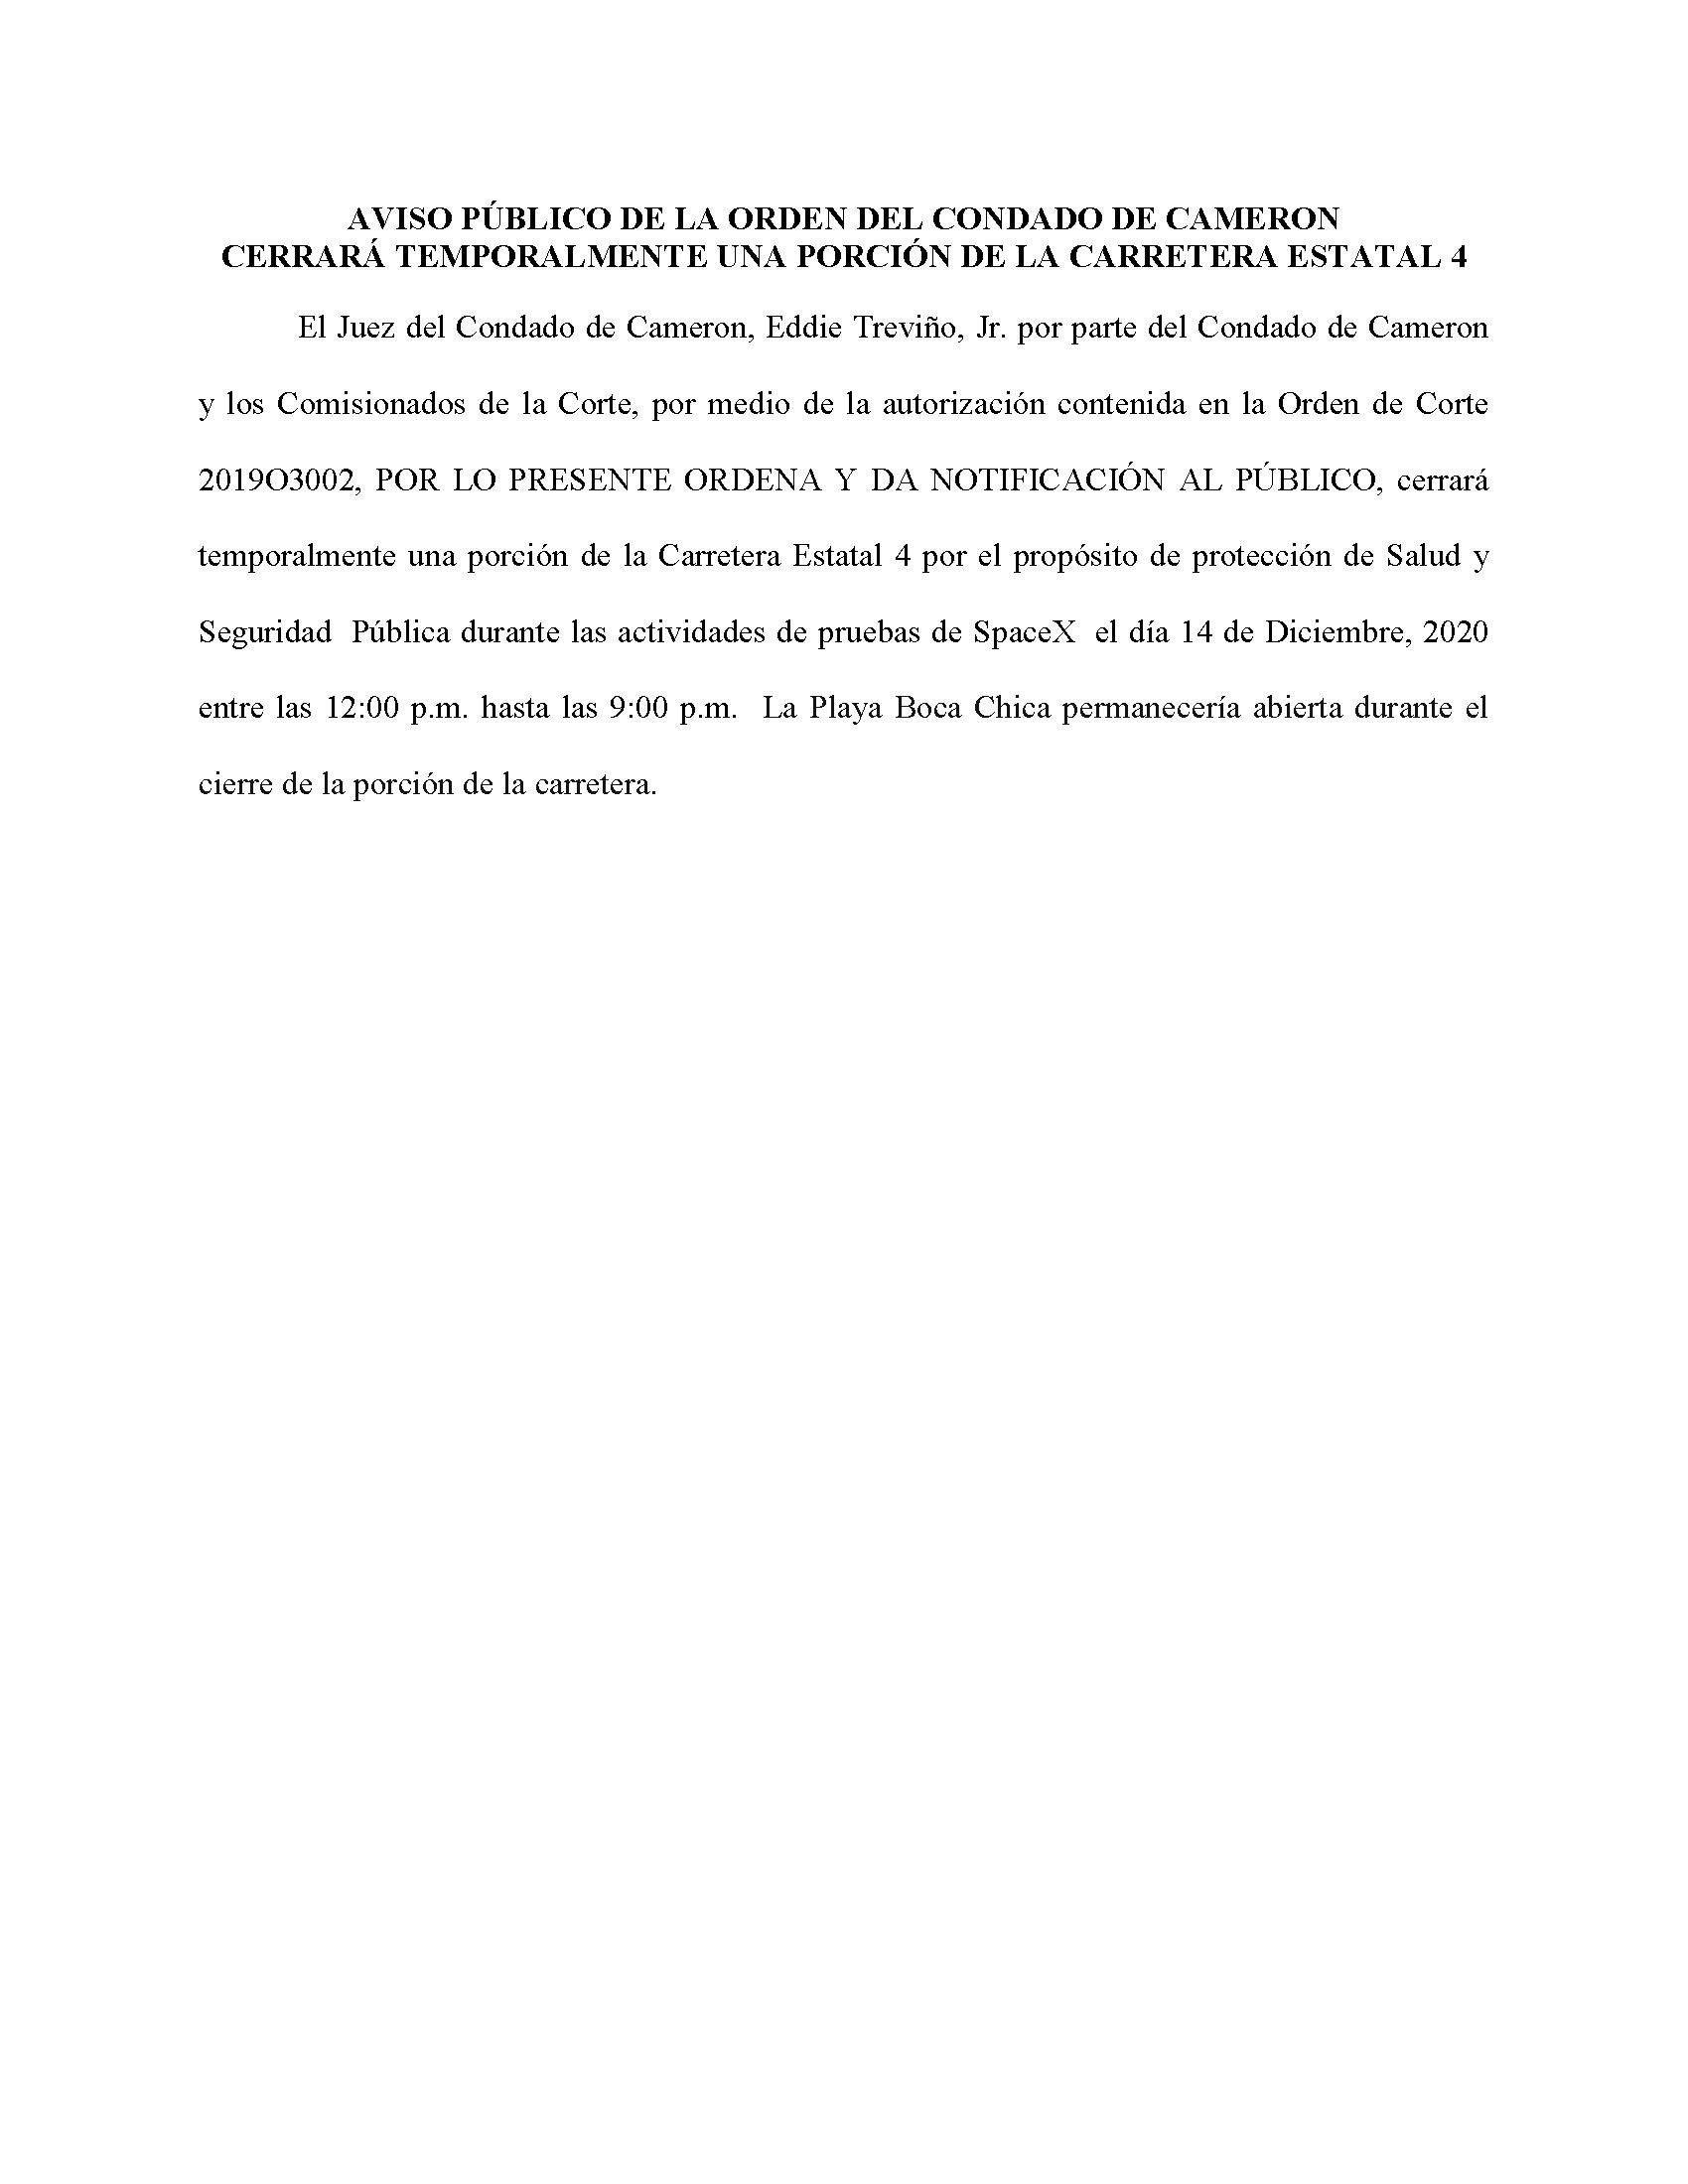 ORDER.CLOSURE OF HIGHWAY 4.SPANISH.12.14.20